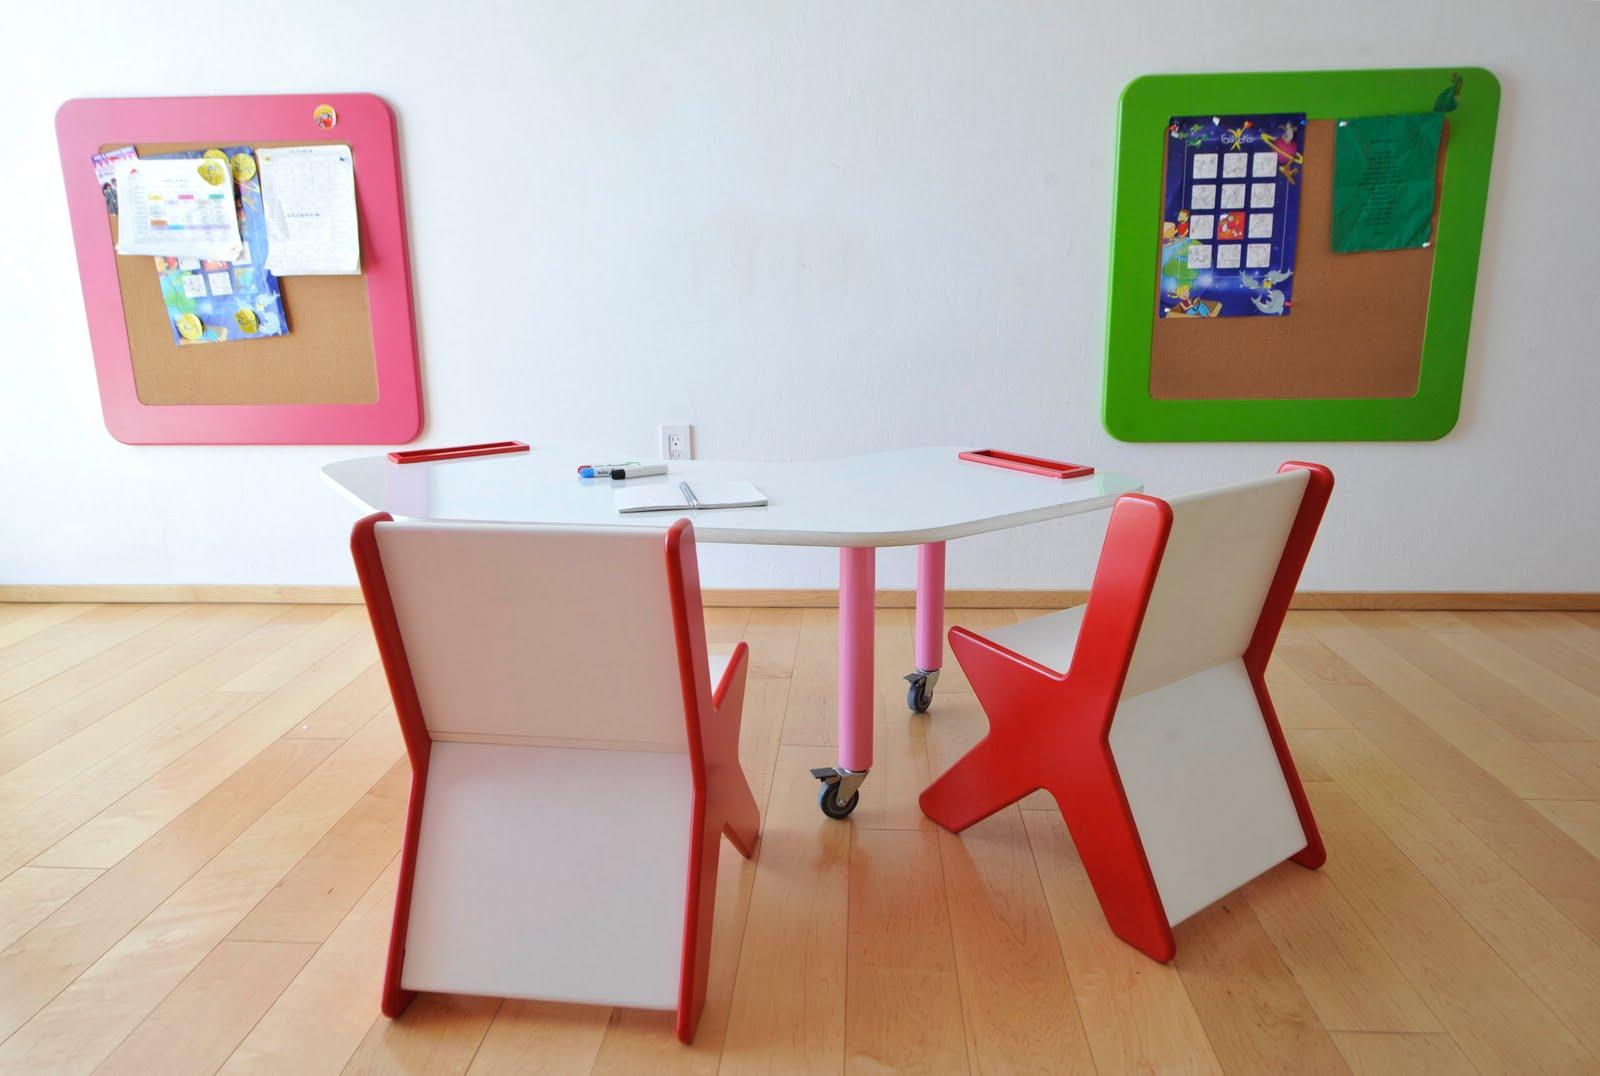 Cubo 3 taller de dise o agosto 2010 for Diseno de muebles guadalajara